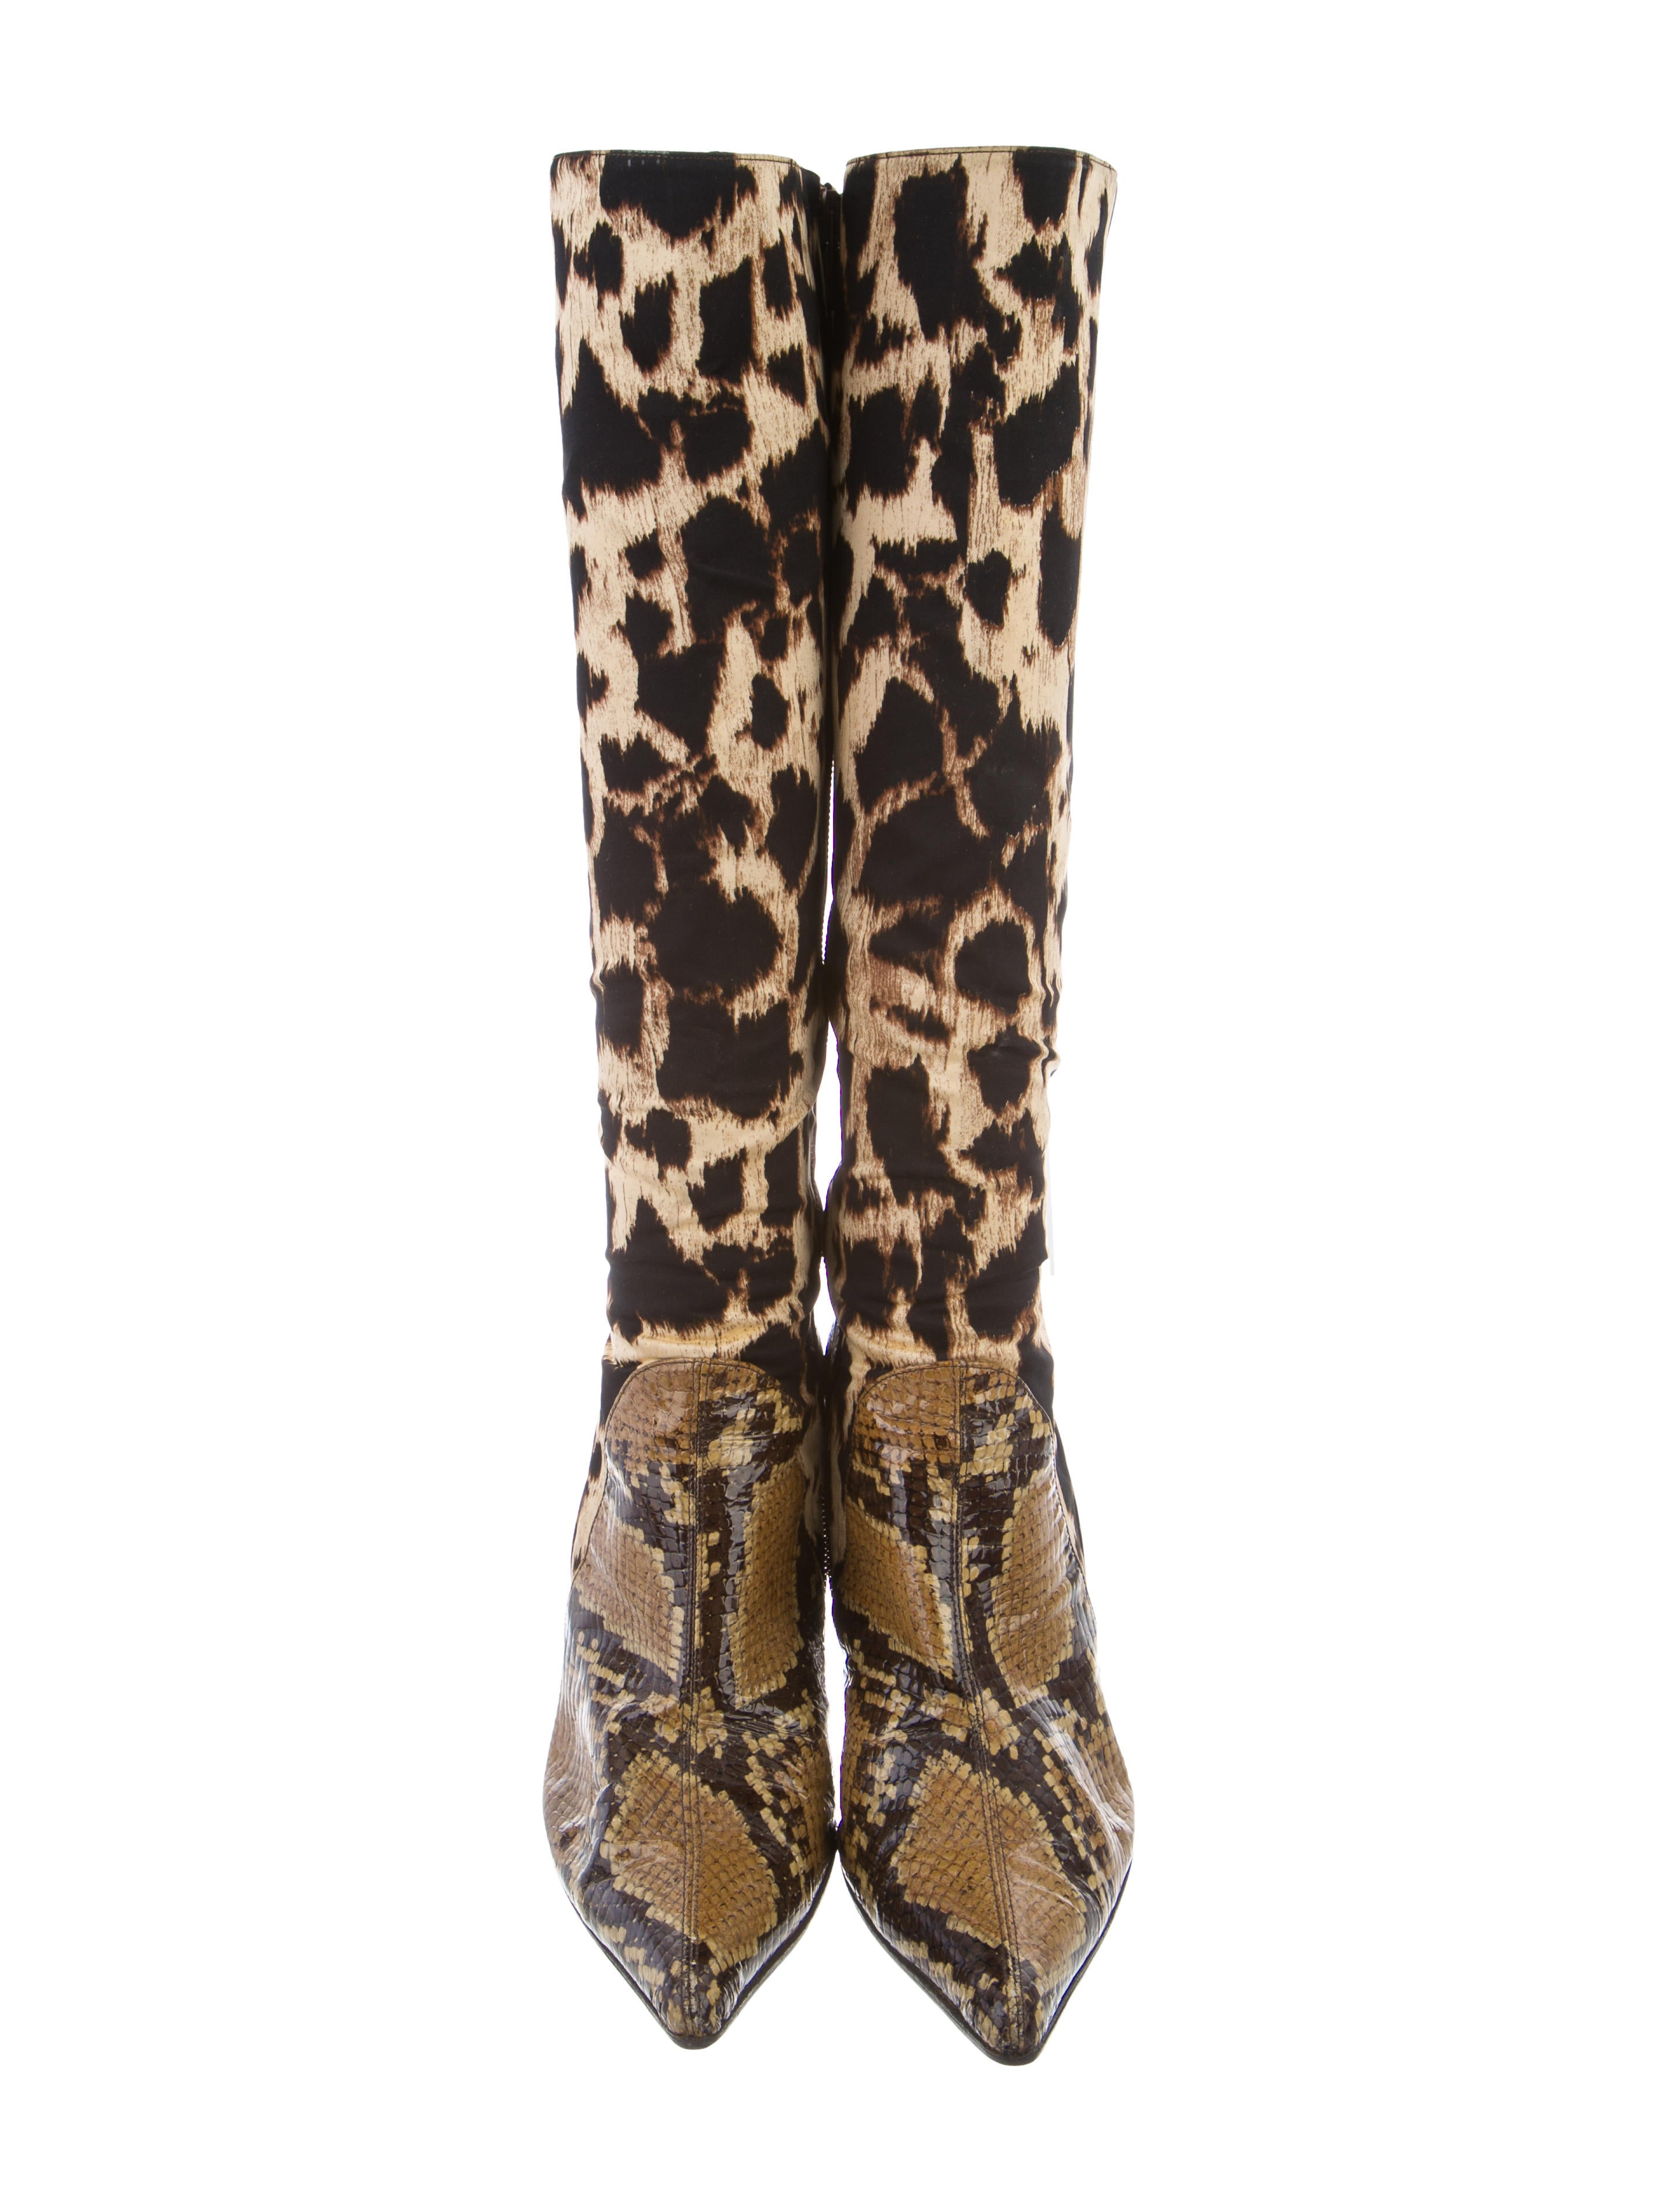 Emanuel Ungaro Canvas Mid-Calf Boots shipping discount authentic PUB76PBdcY